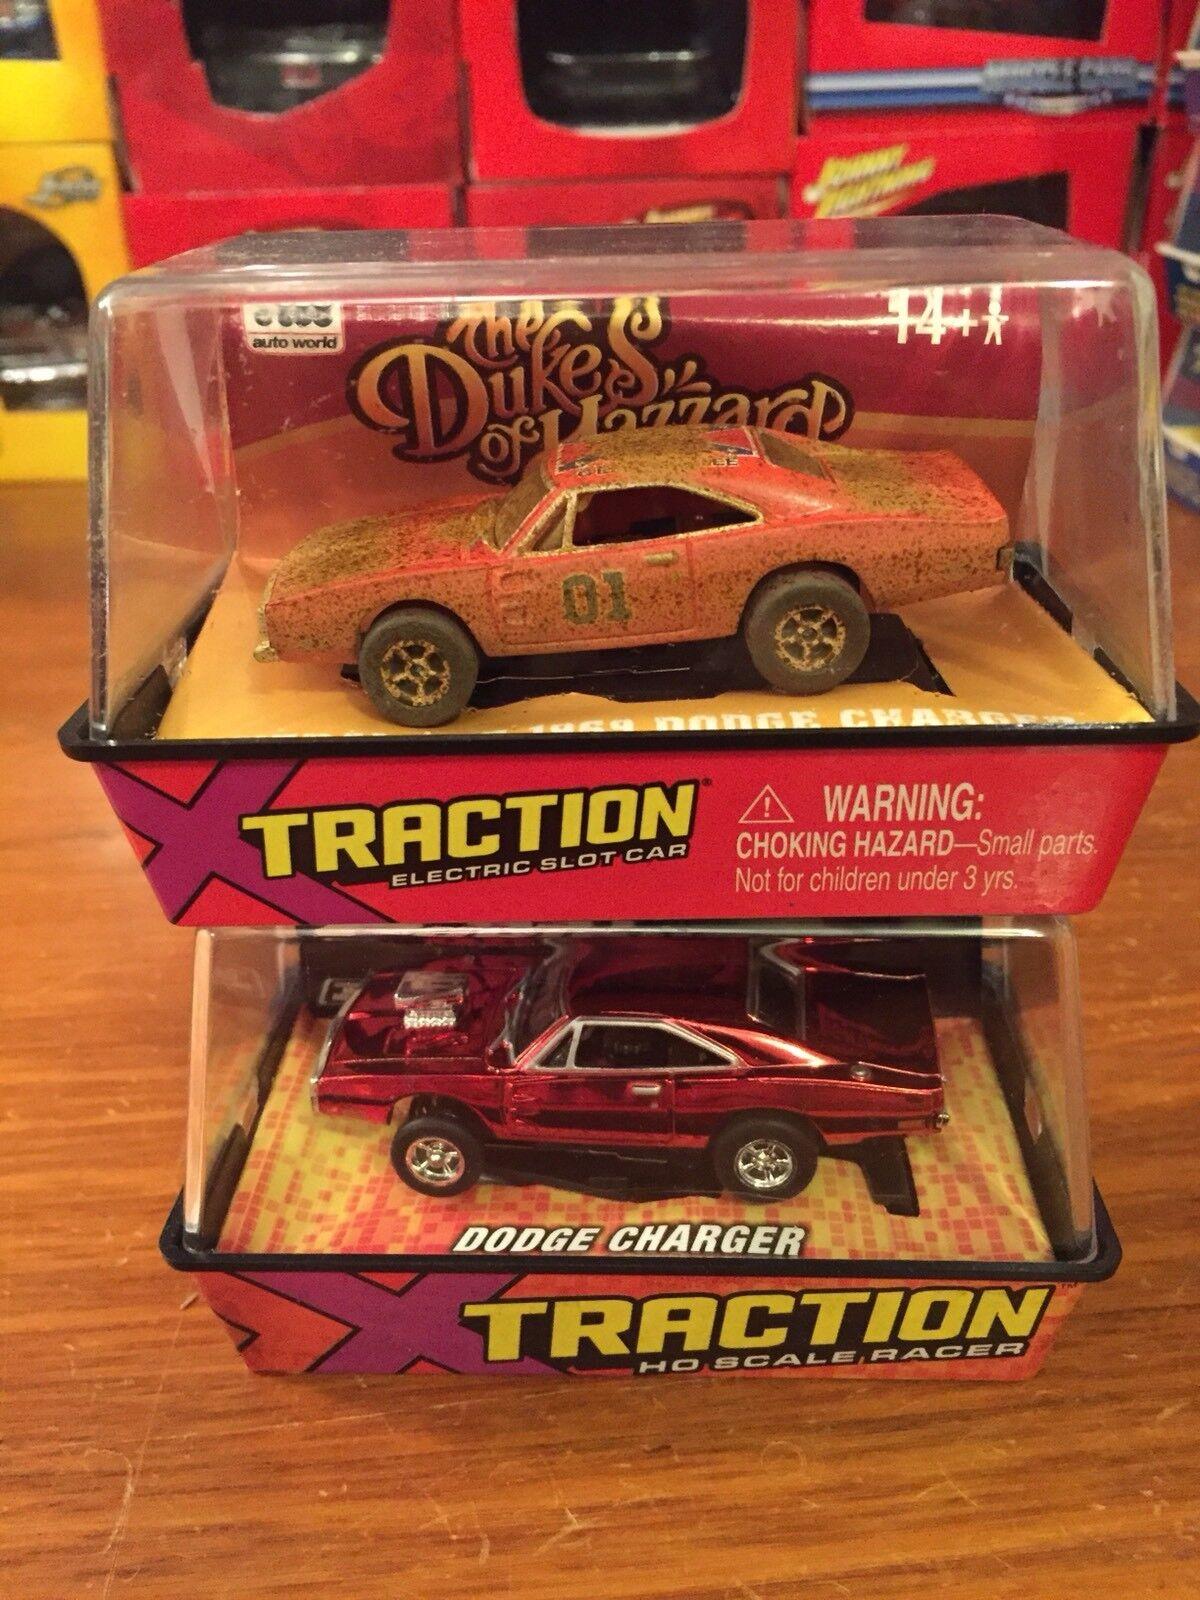 Johnny Lightning Slot Cars Dirty General Lee & F&F Dodge Charger